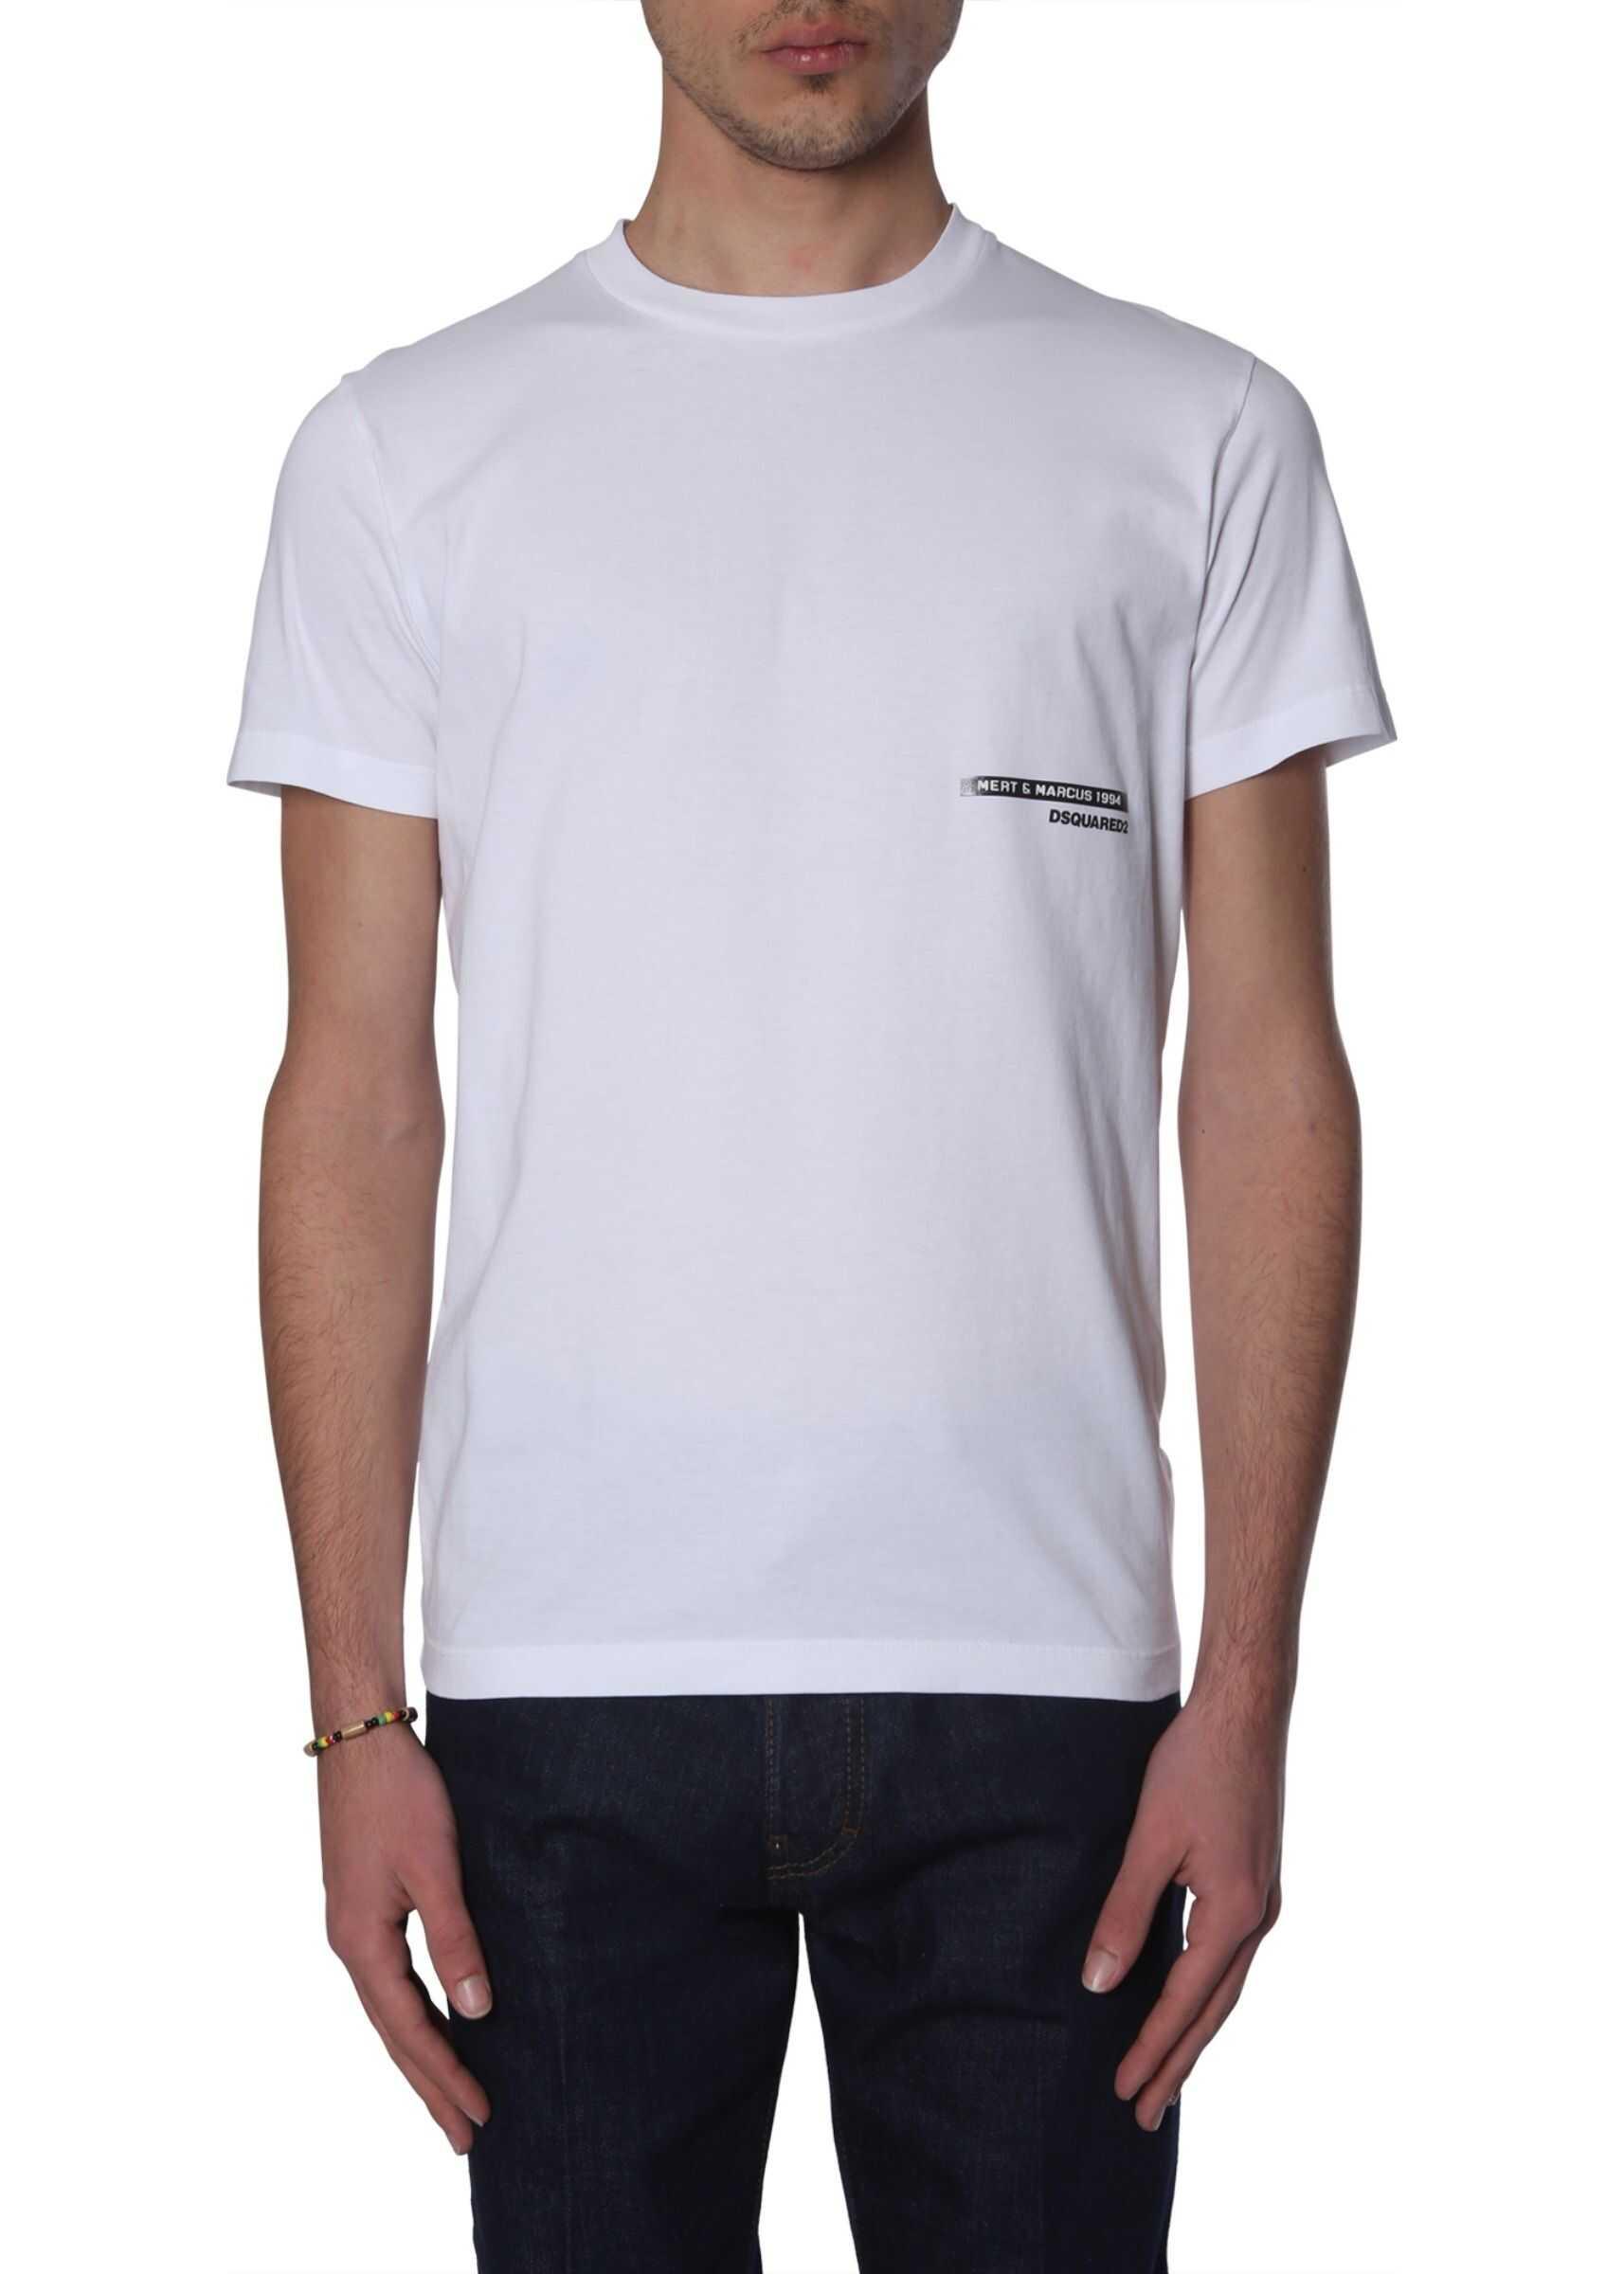 DSQUARED2 Mert & Marcus 1994 X Dsquared T-Shirt WHITE